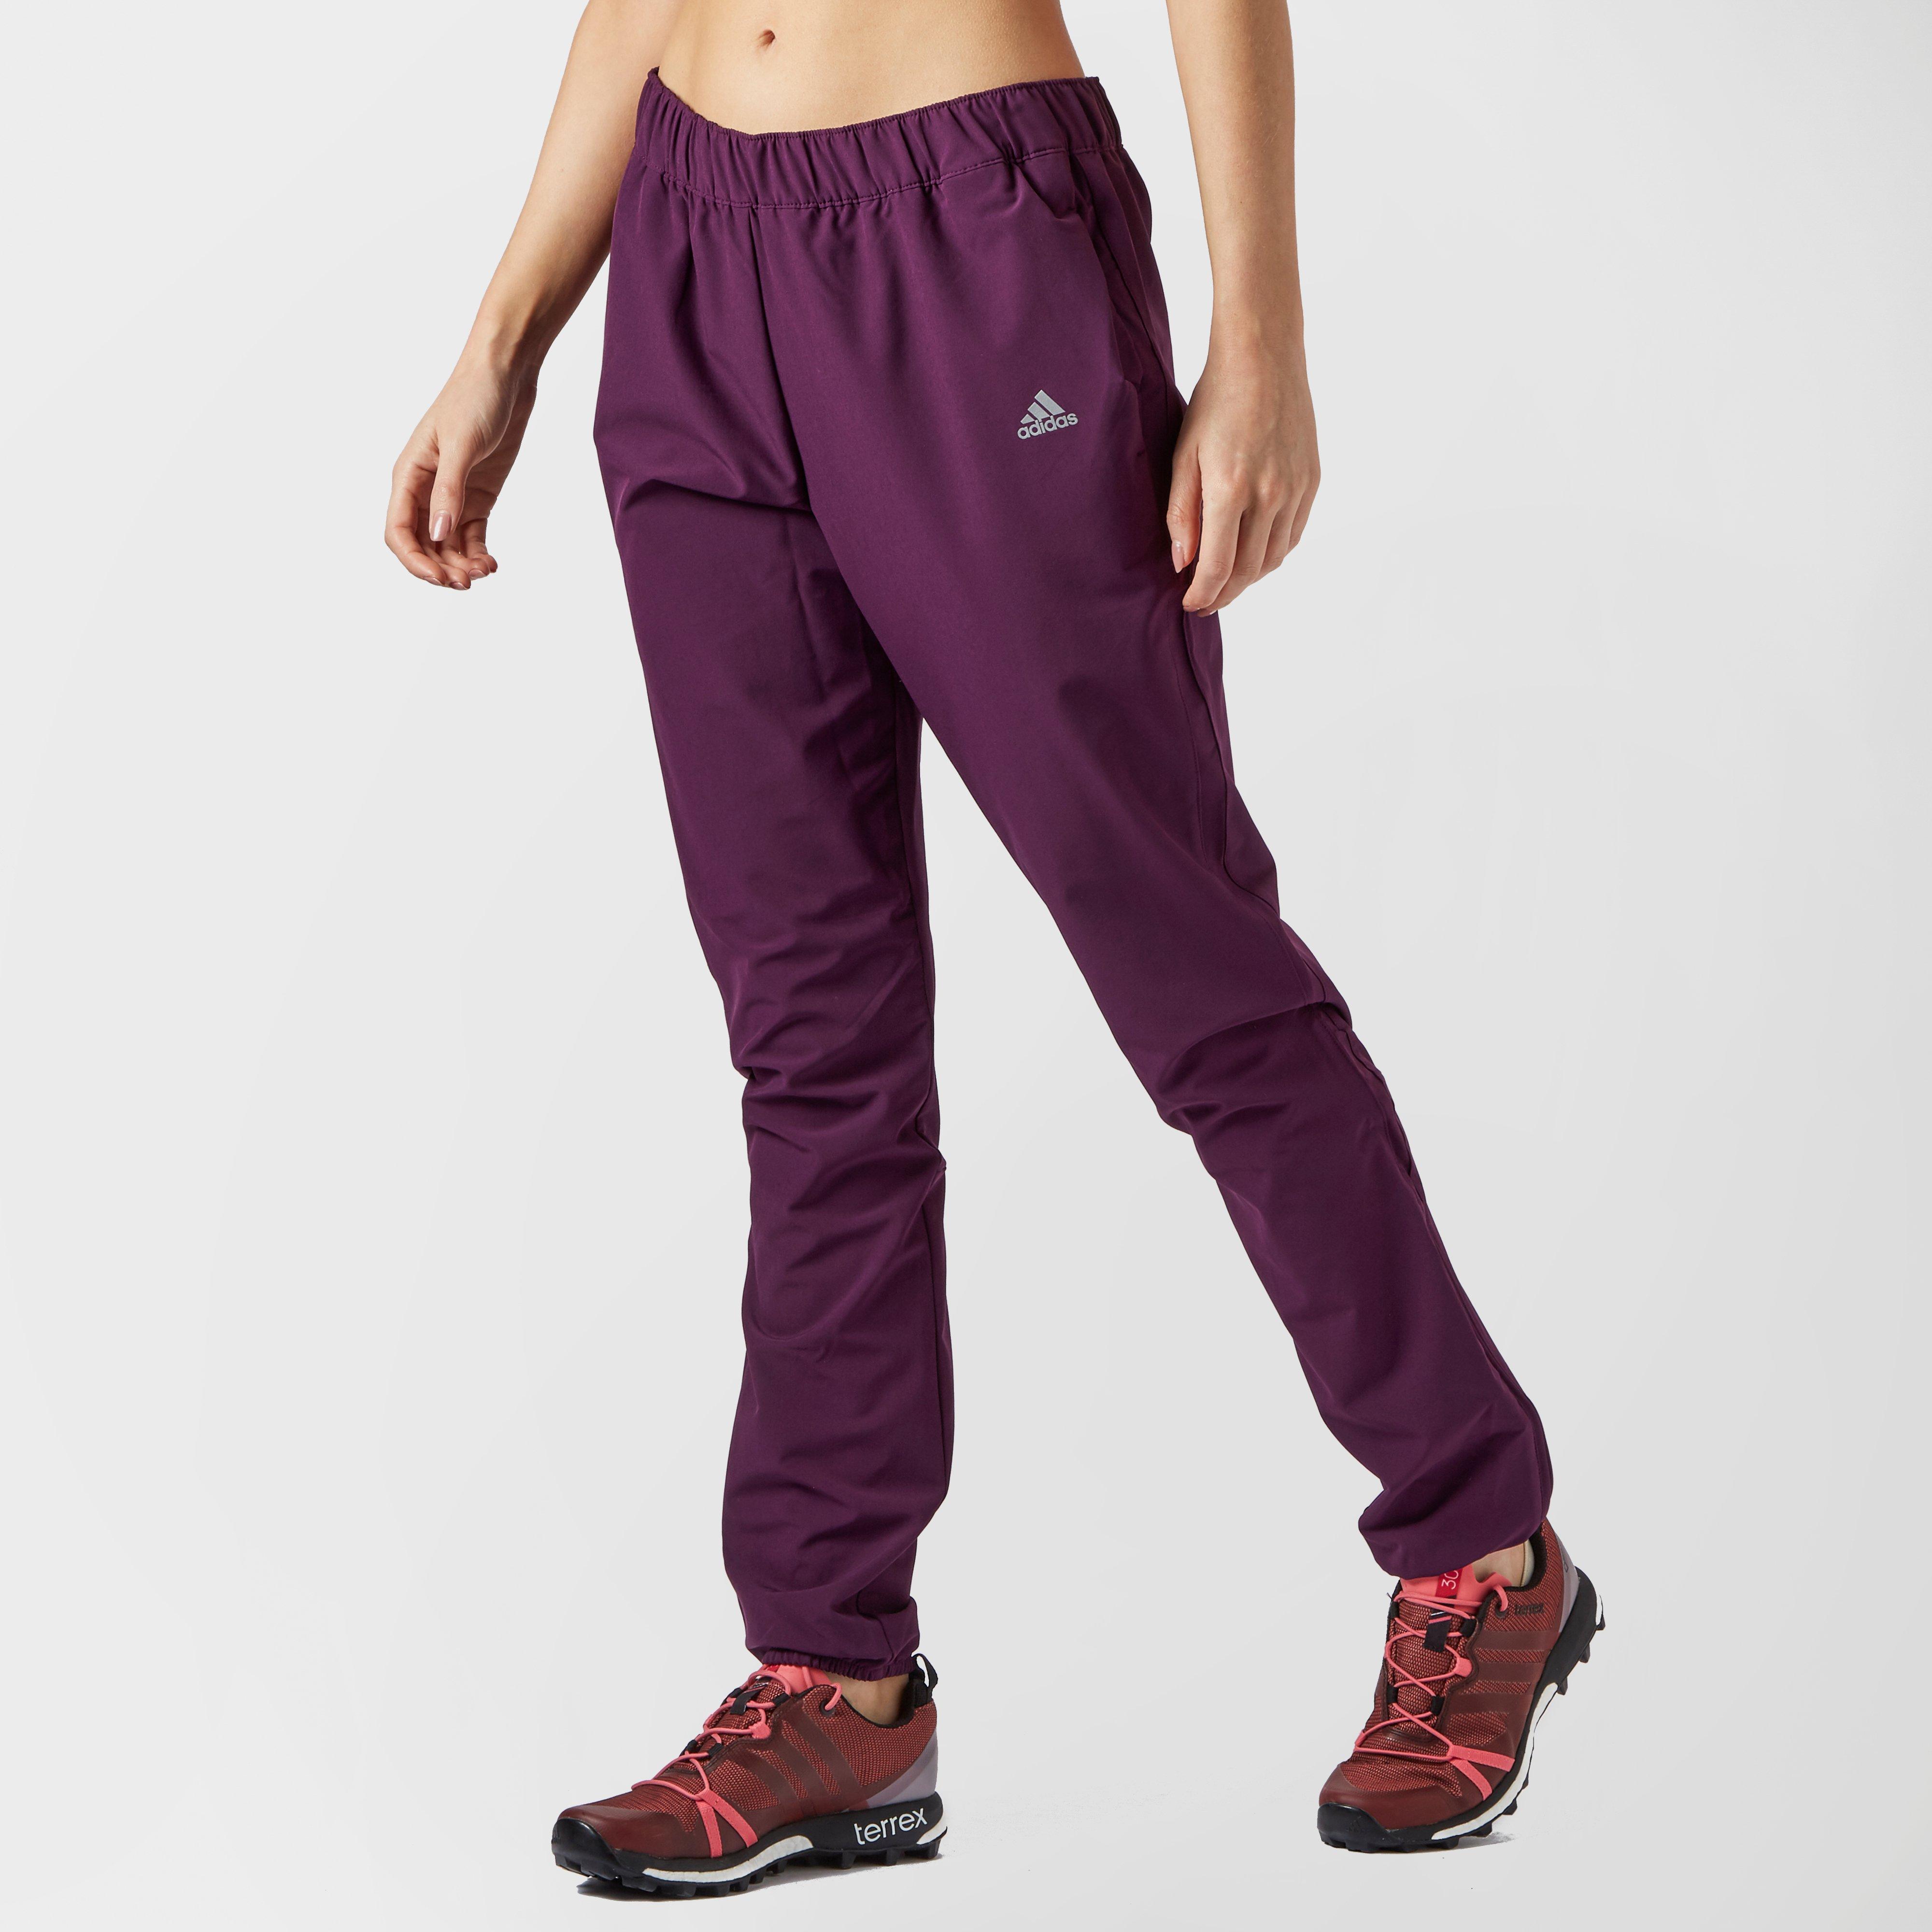 86f78e27345 Adidas Women's Response Soft-Shell Pants